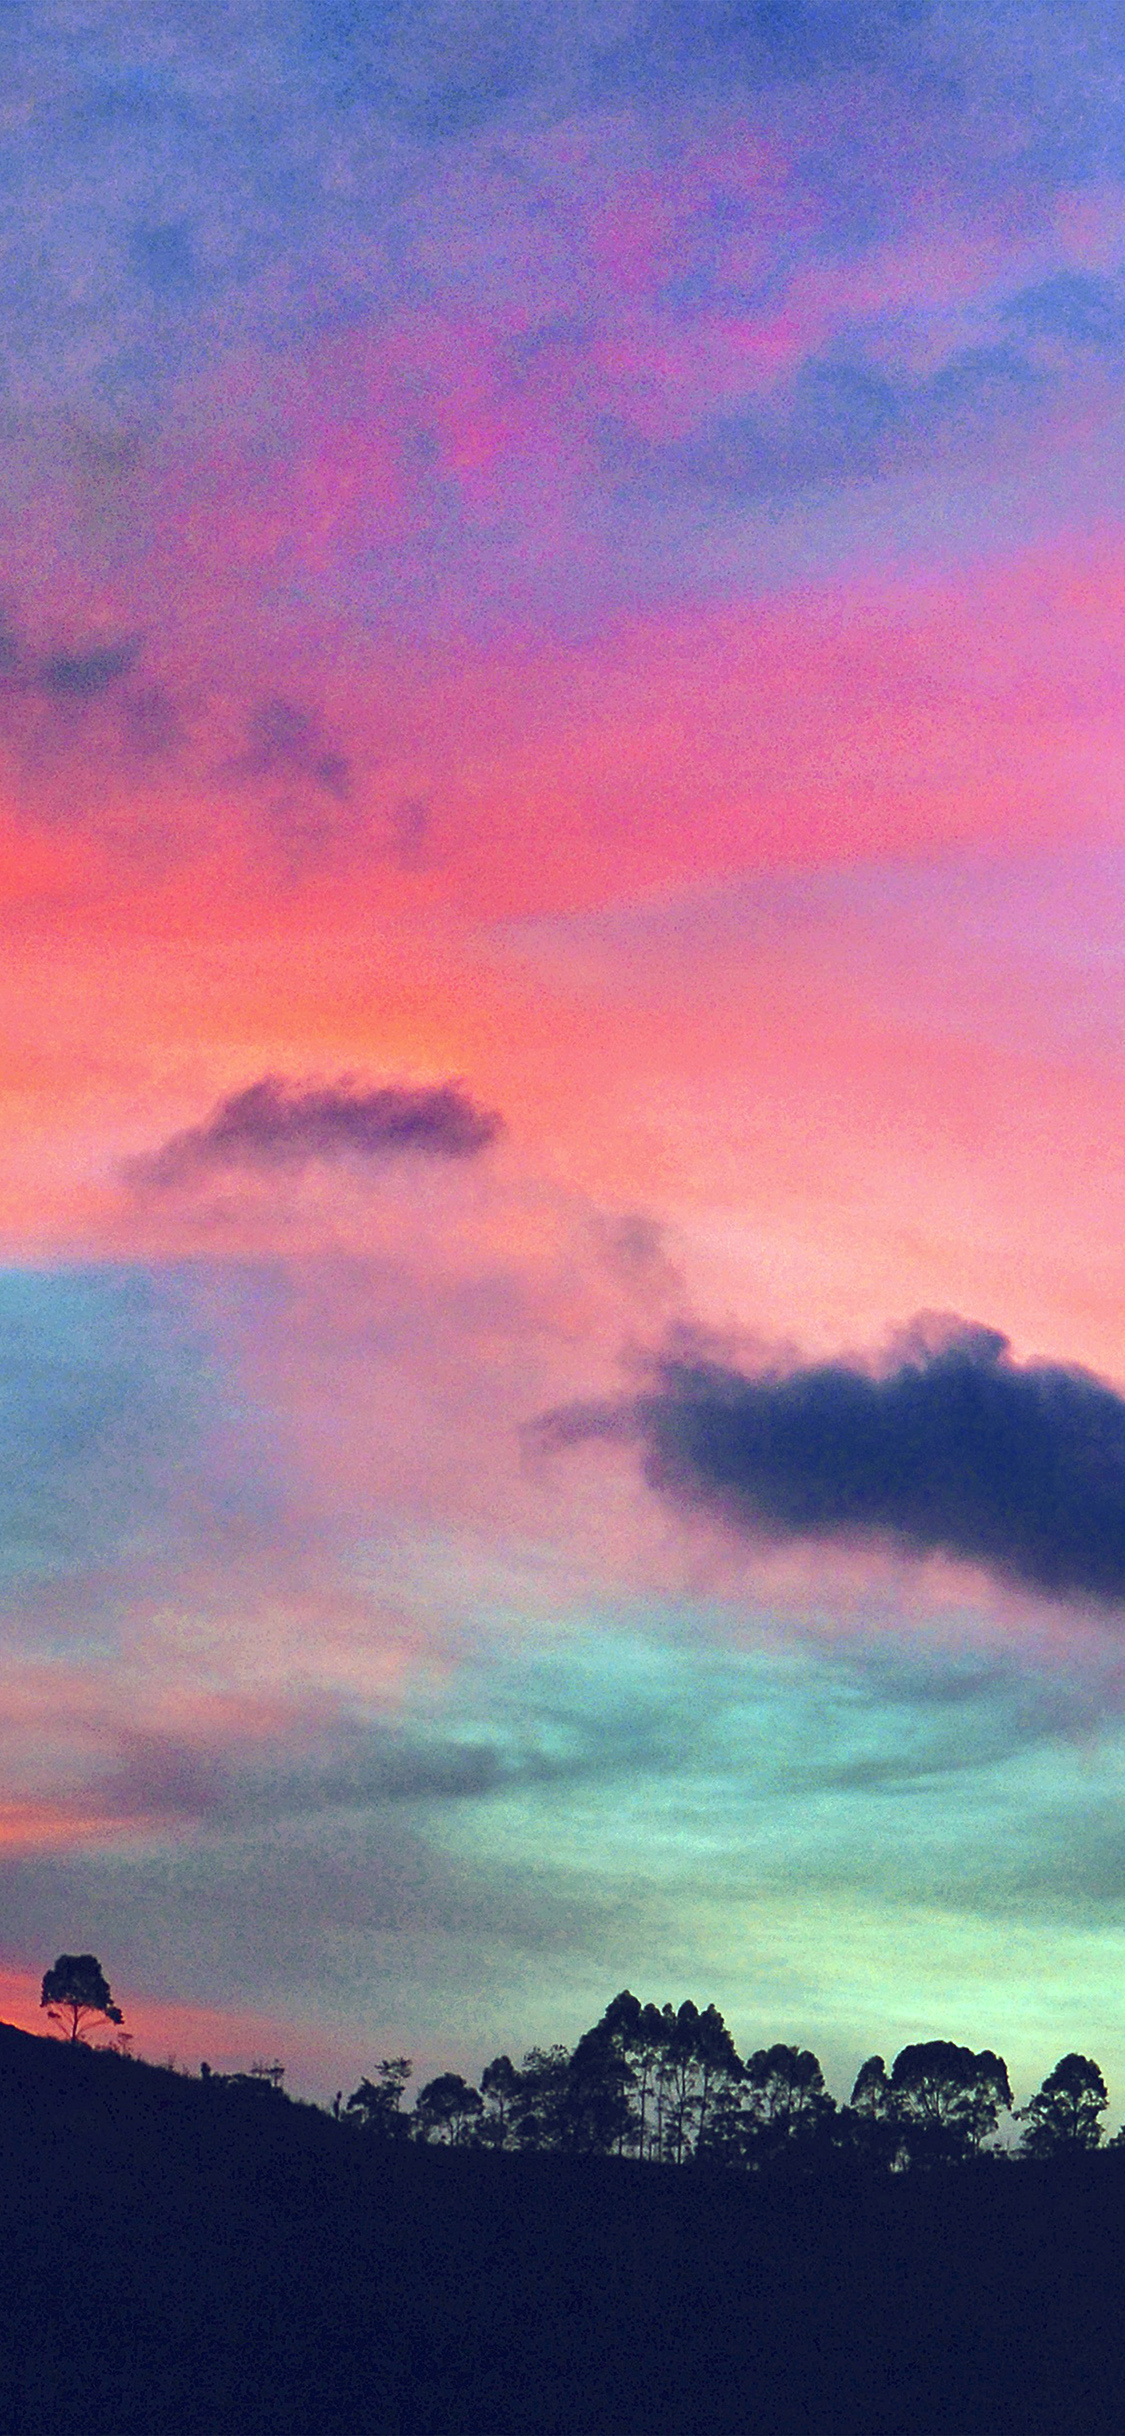 Iphone Se Fall Colors Wallpaper Iphonexpapers Com Apple Iphone Wallpaper Ng96 Sky Rainbow